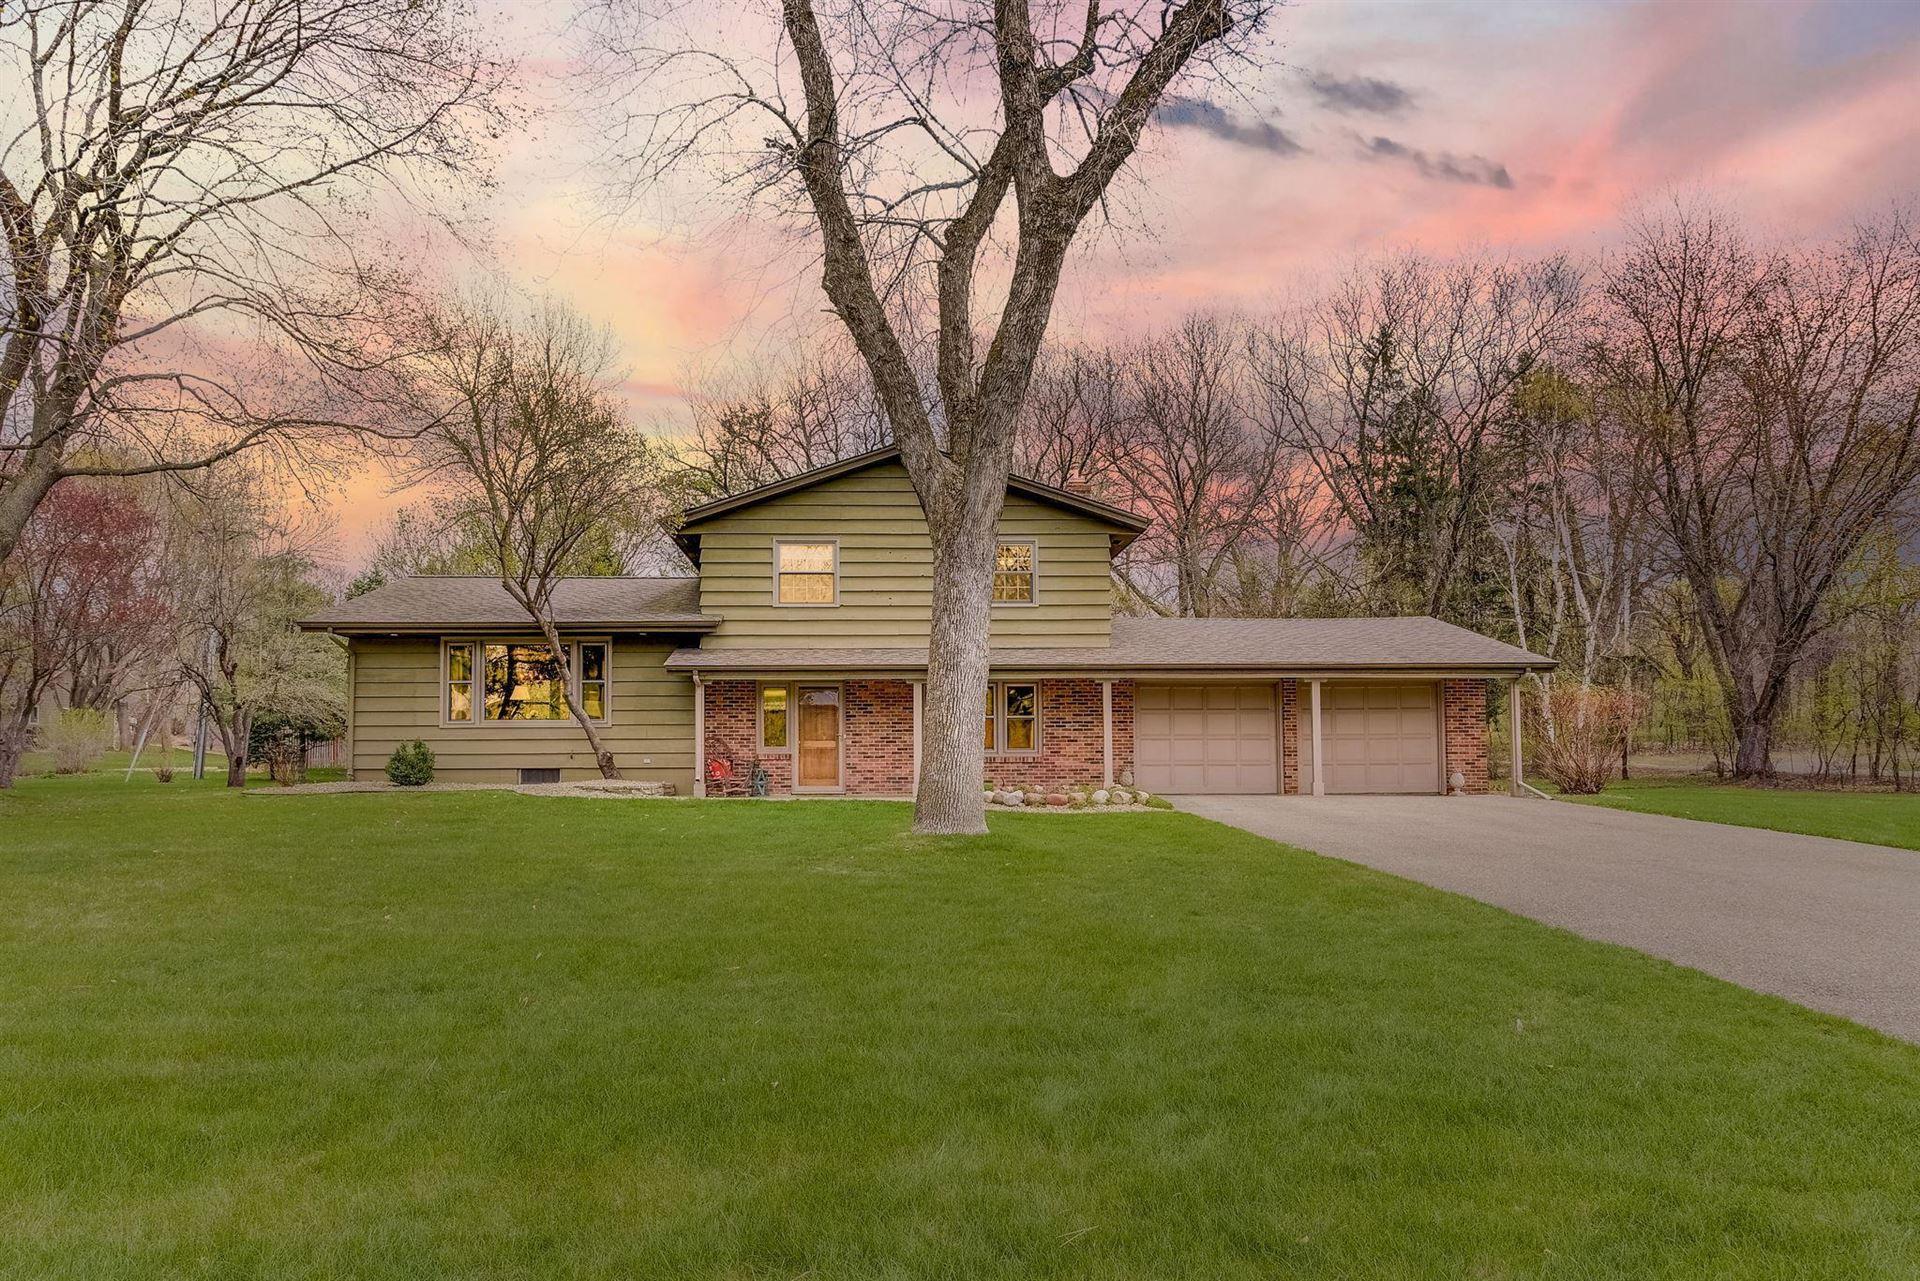 Photo of 6110 Northwood Ridge, Bloomington, MN 55438 (MLS # 5743341)